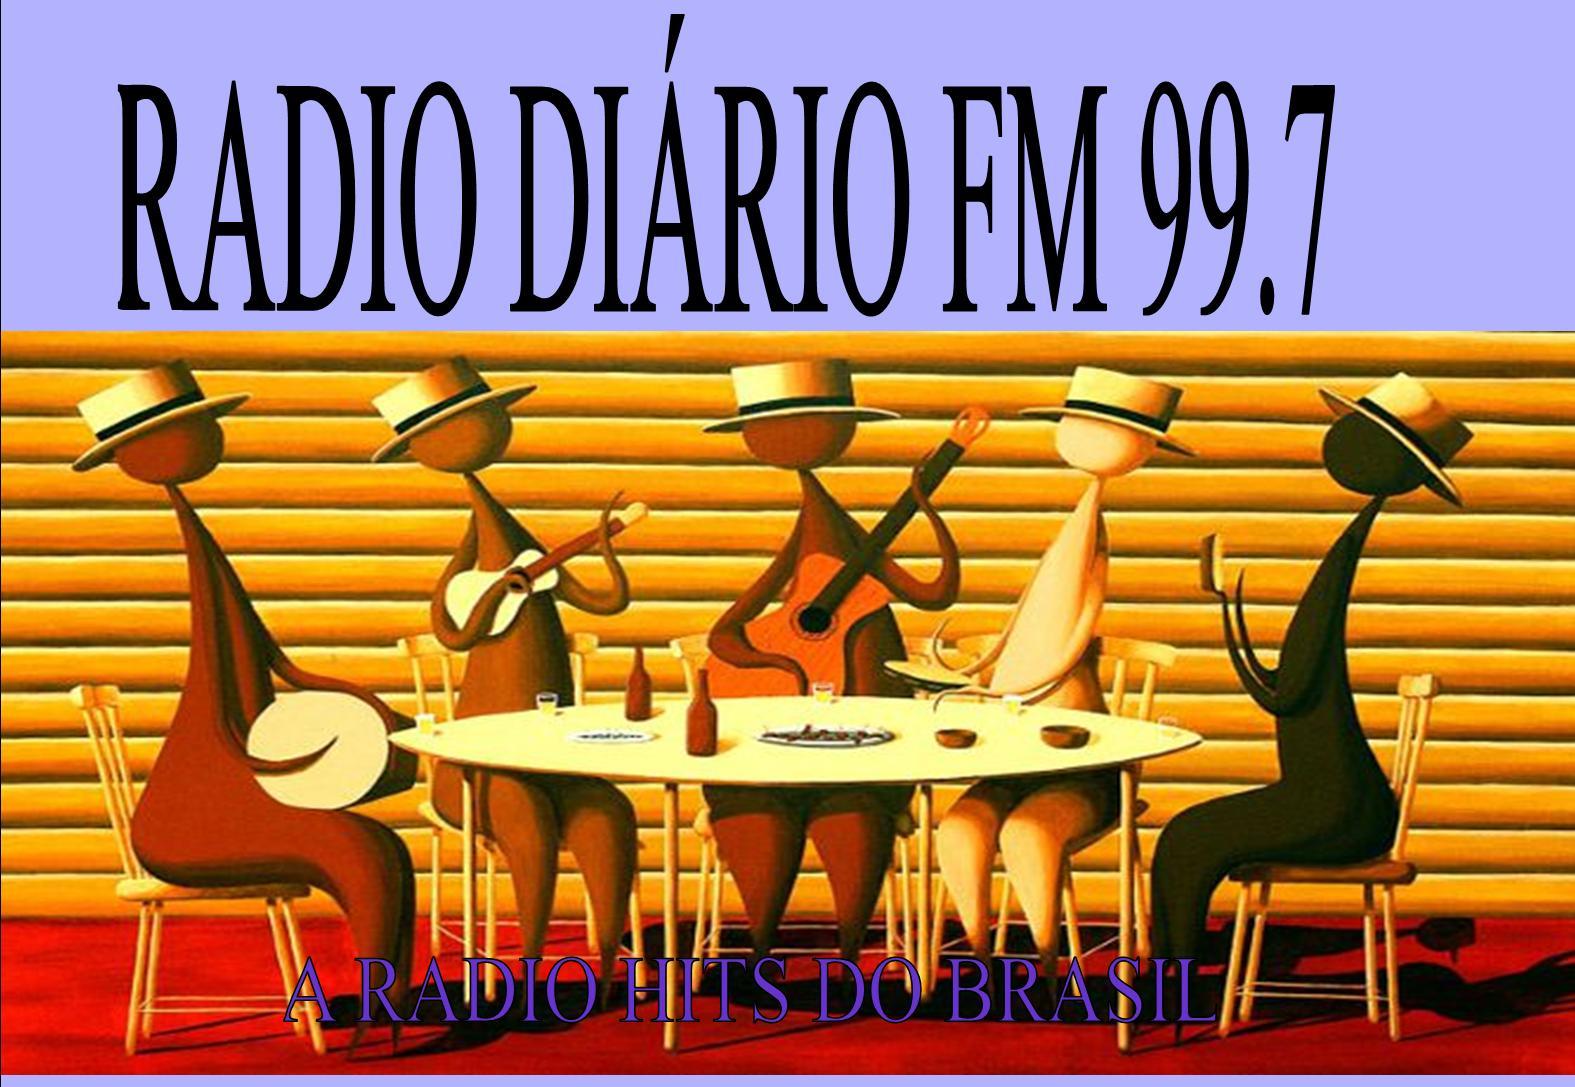 Radio Diario Fm 99,7 Uberaba Minas gerasis